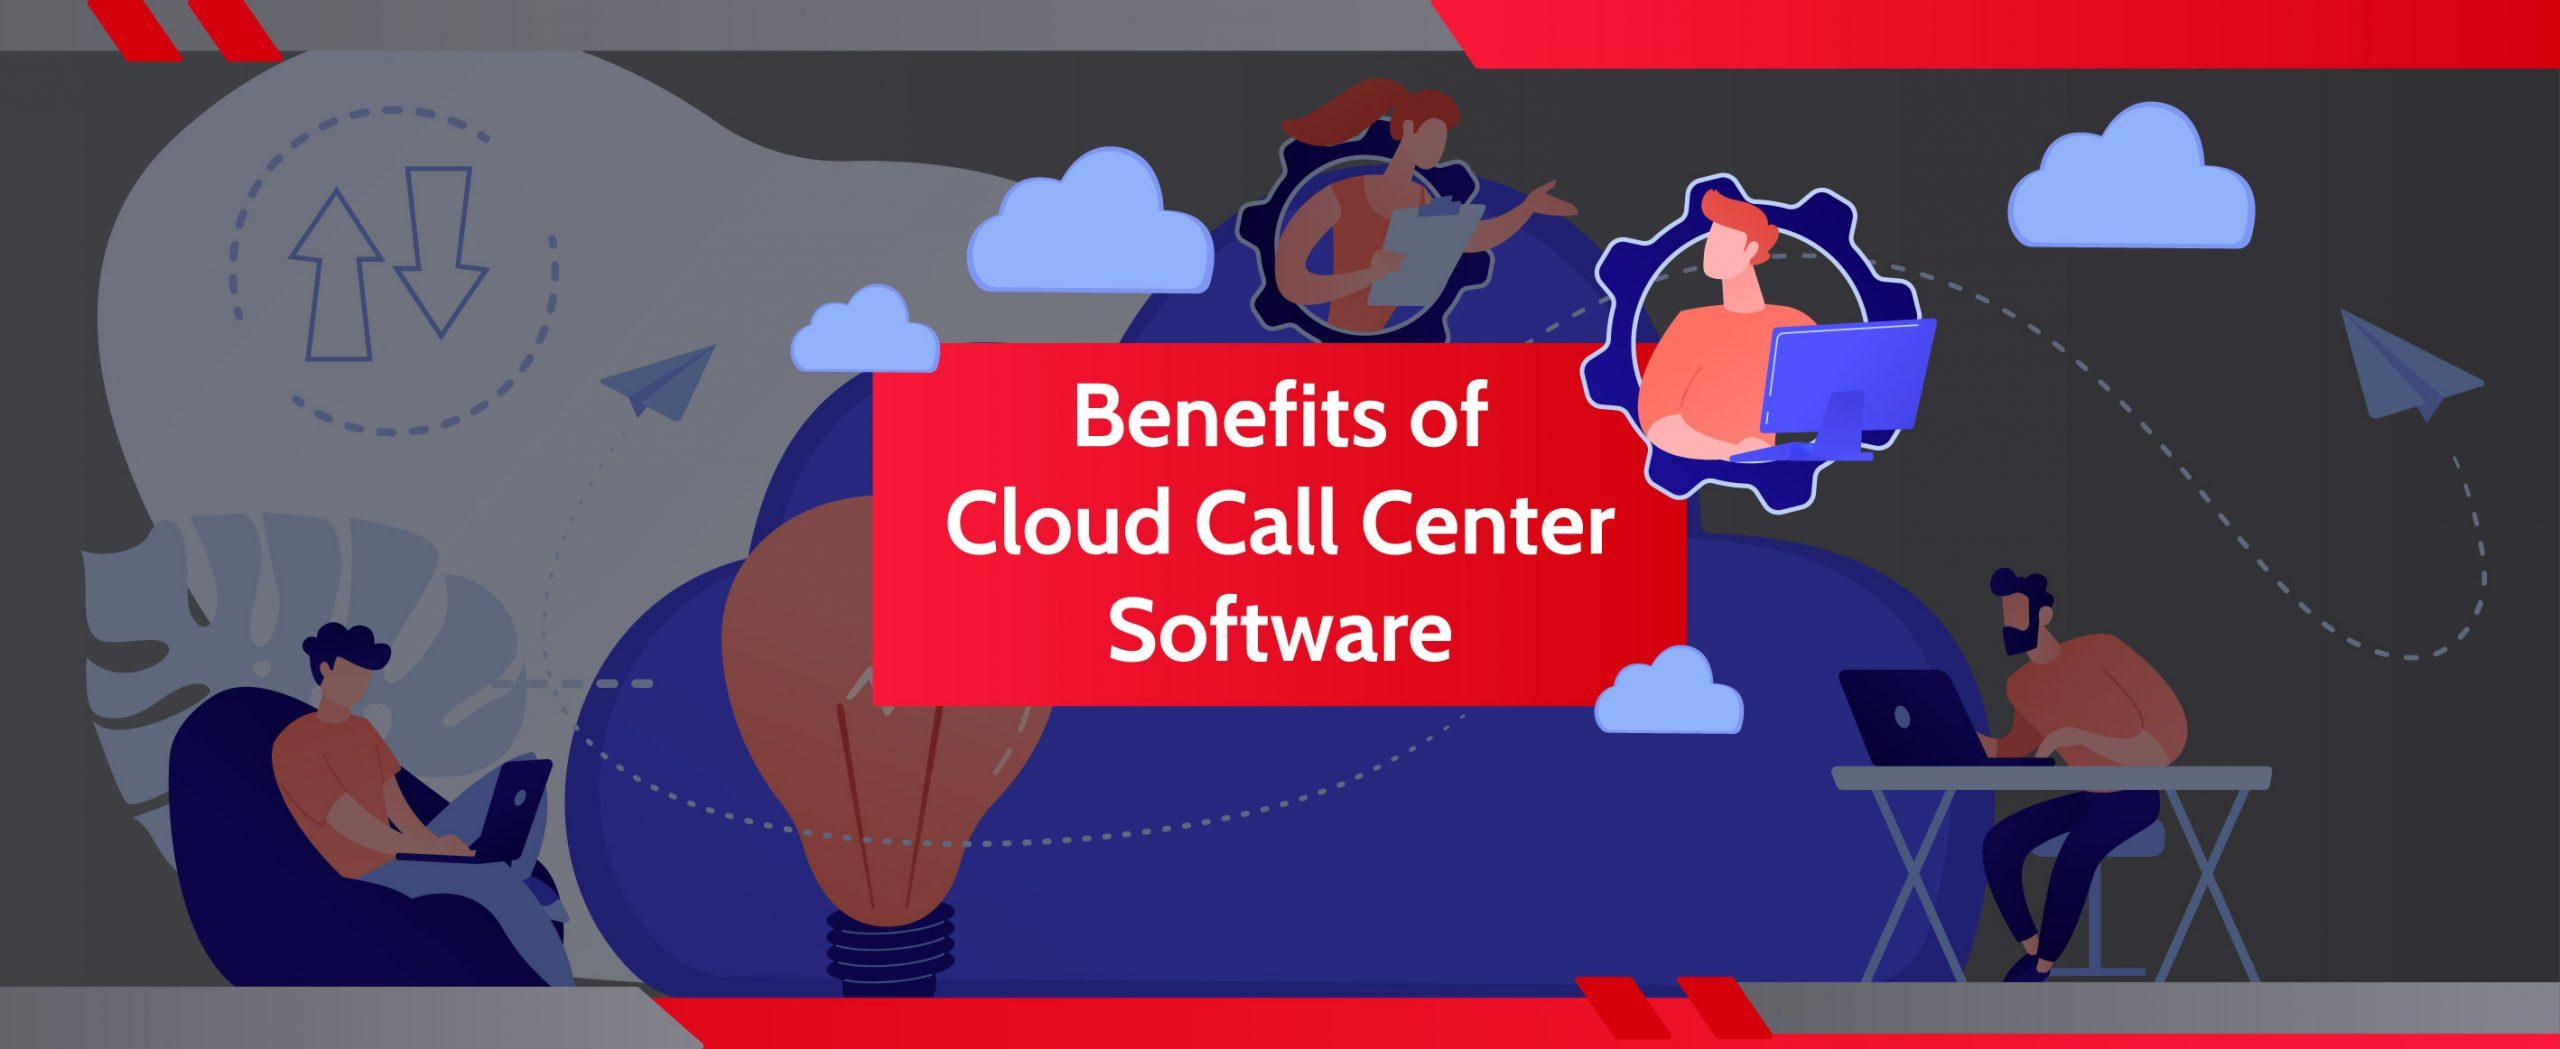 Benefits of Cloud Call Center Software